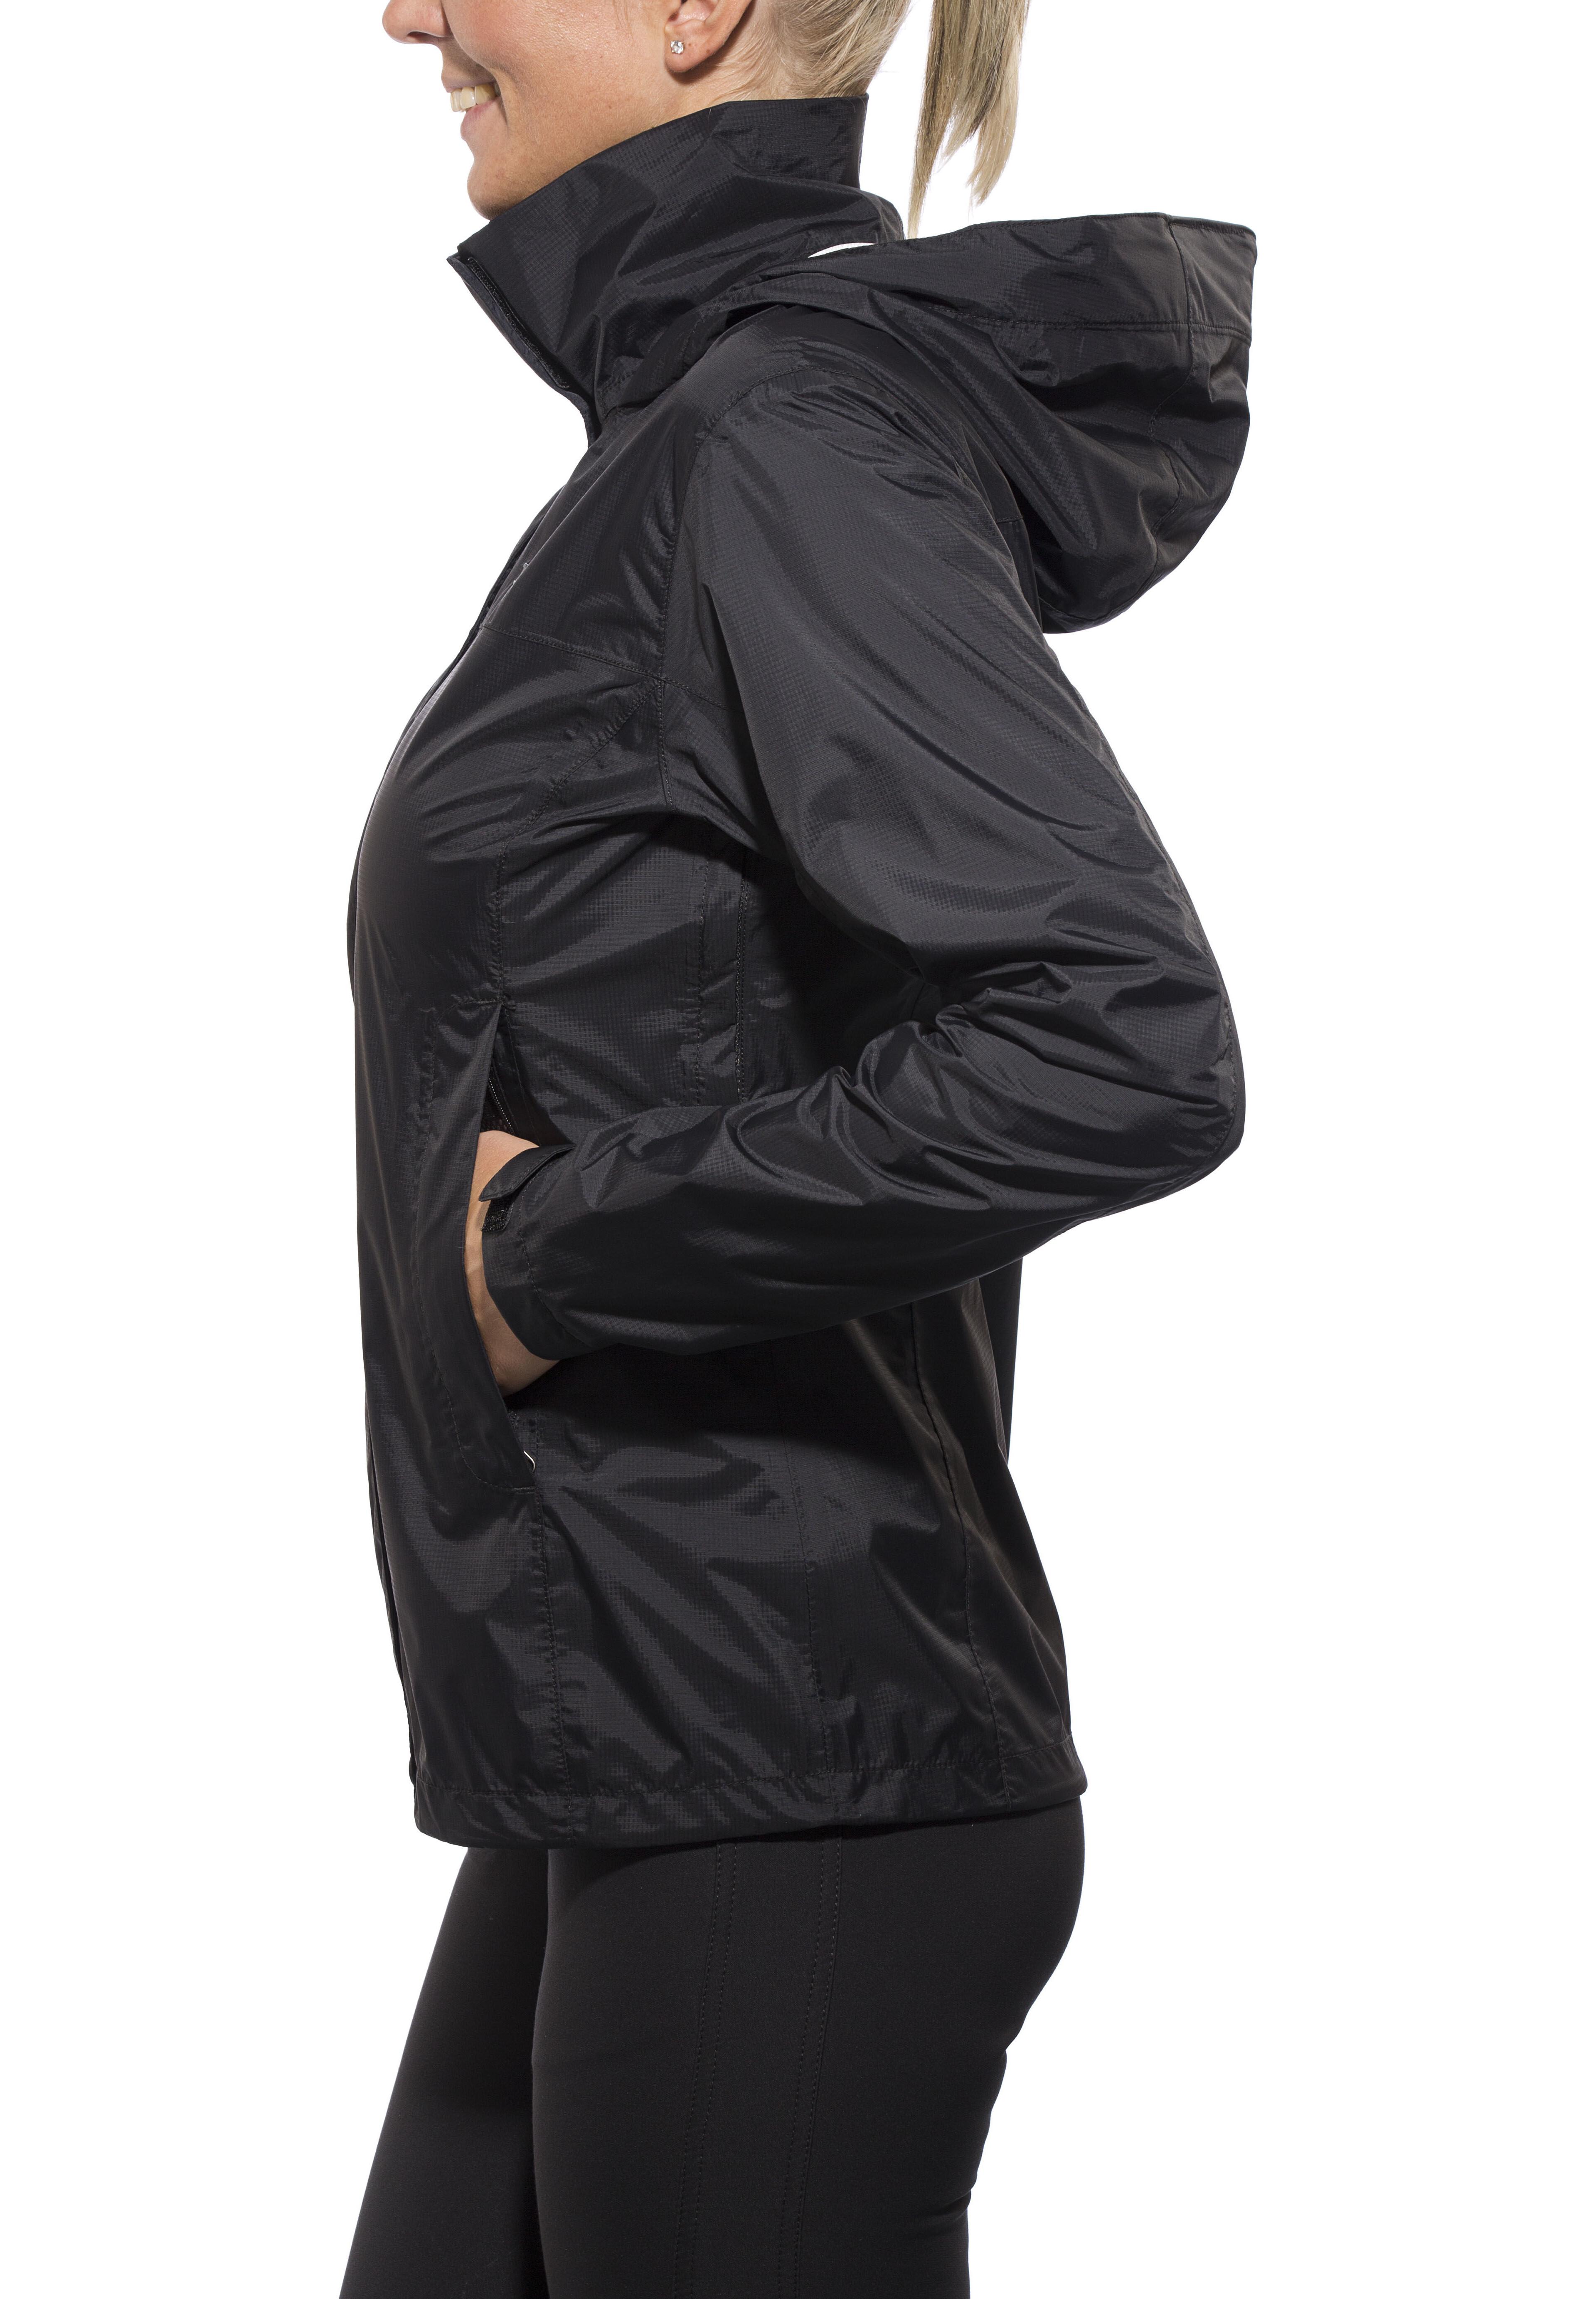 Marmot Women S Alexie Jacket: Marmot PreCip Jacket Women Black